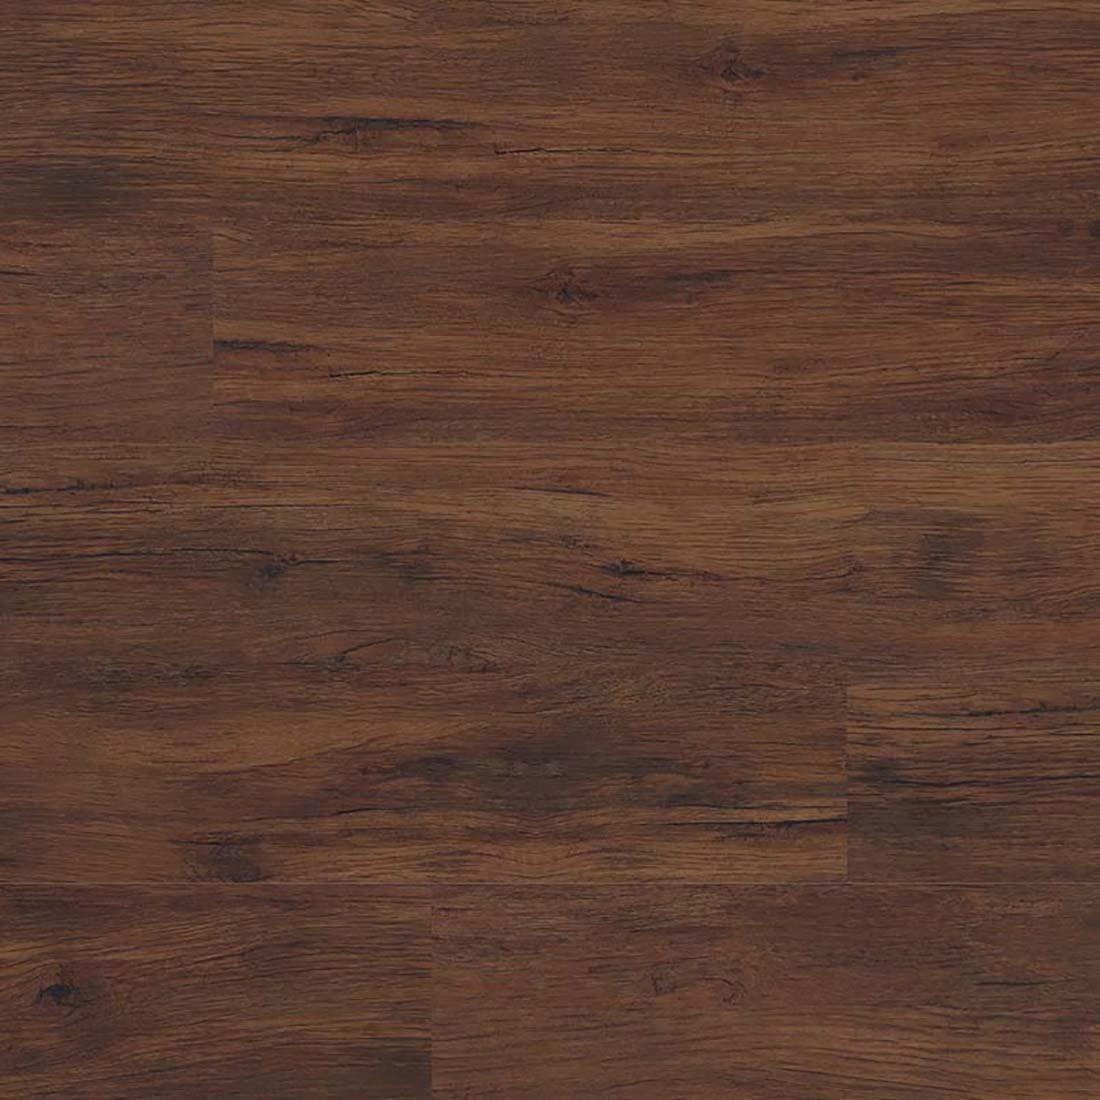 Aged Walnut / 6.5mm / SPC / Click Lock Vinyl Planks - 6.5mm SPC Click Lock - Lakeshore Collection 0